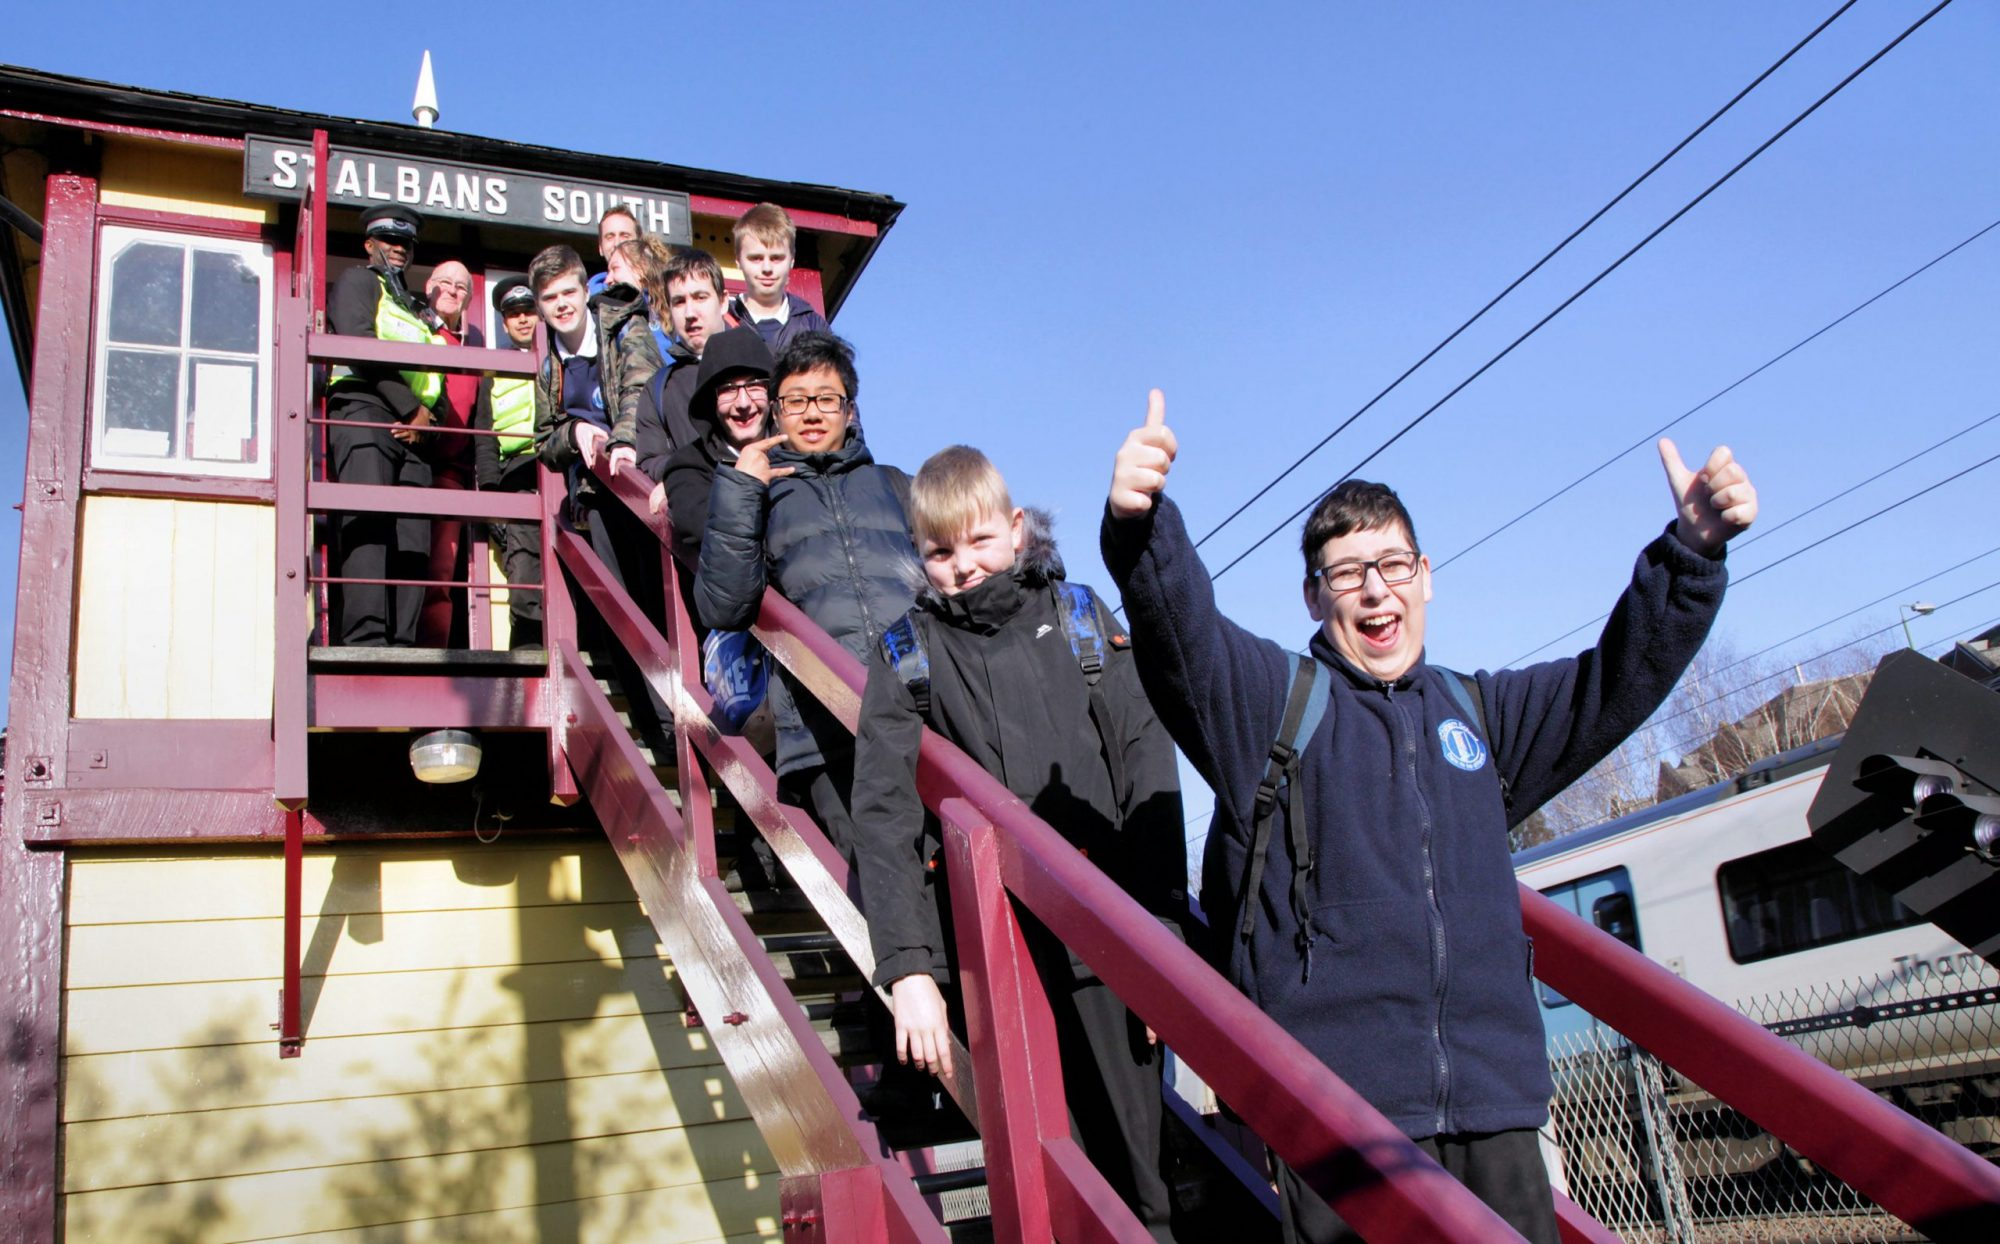 School children at St Albans station